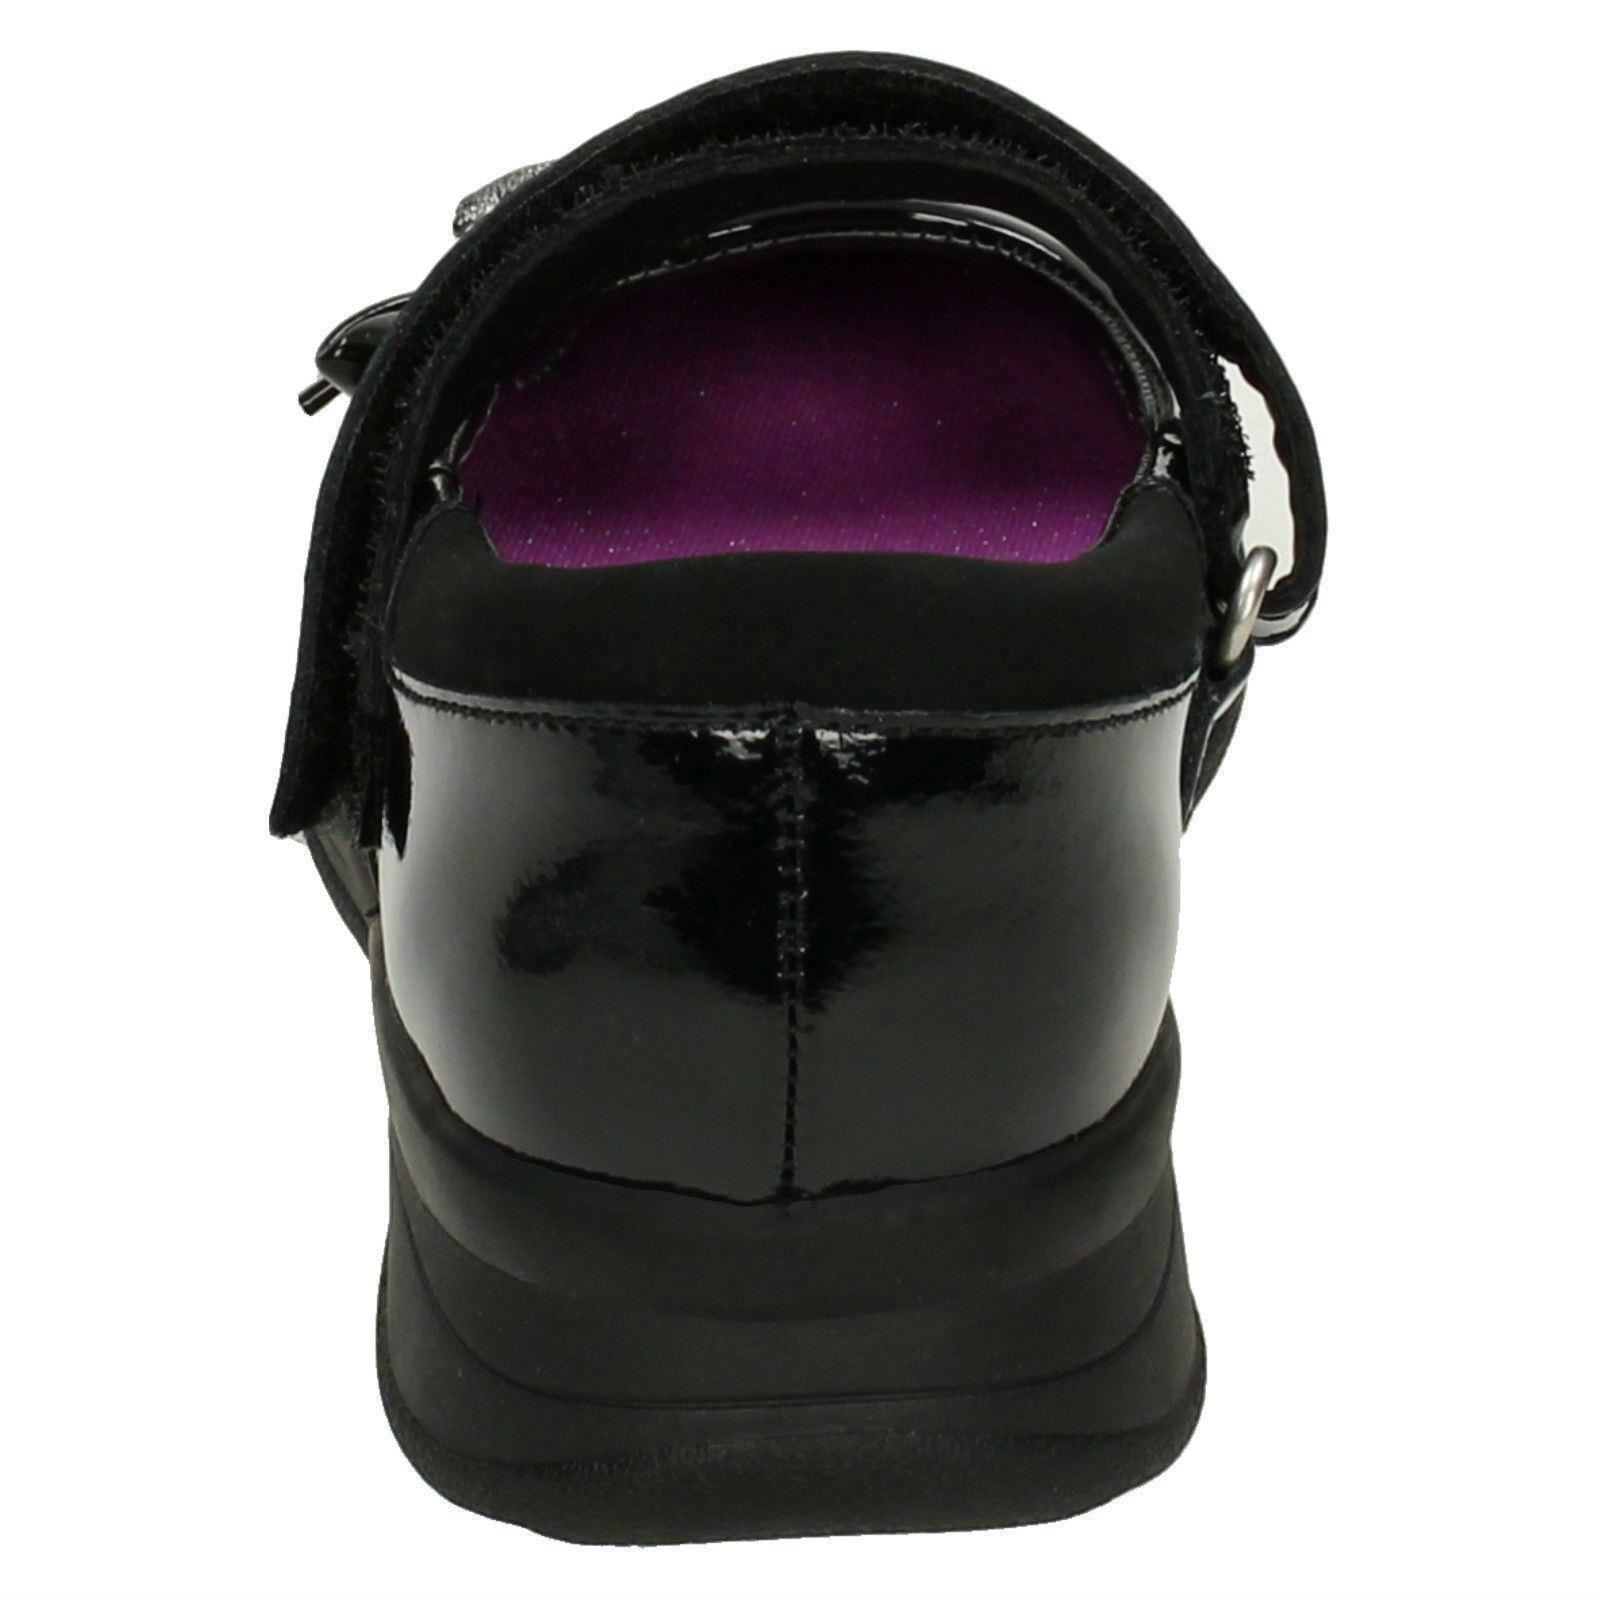 Mariel Wish Inf Gloforms By Clarks Girls Bow Trim School Shoes